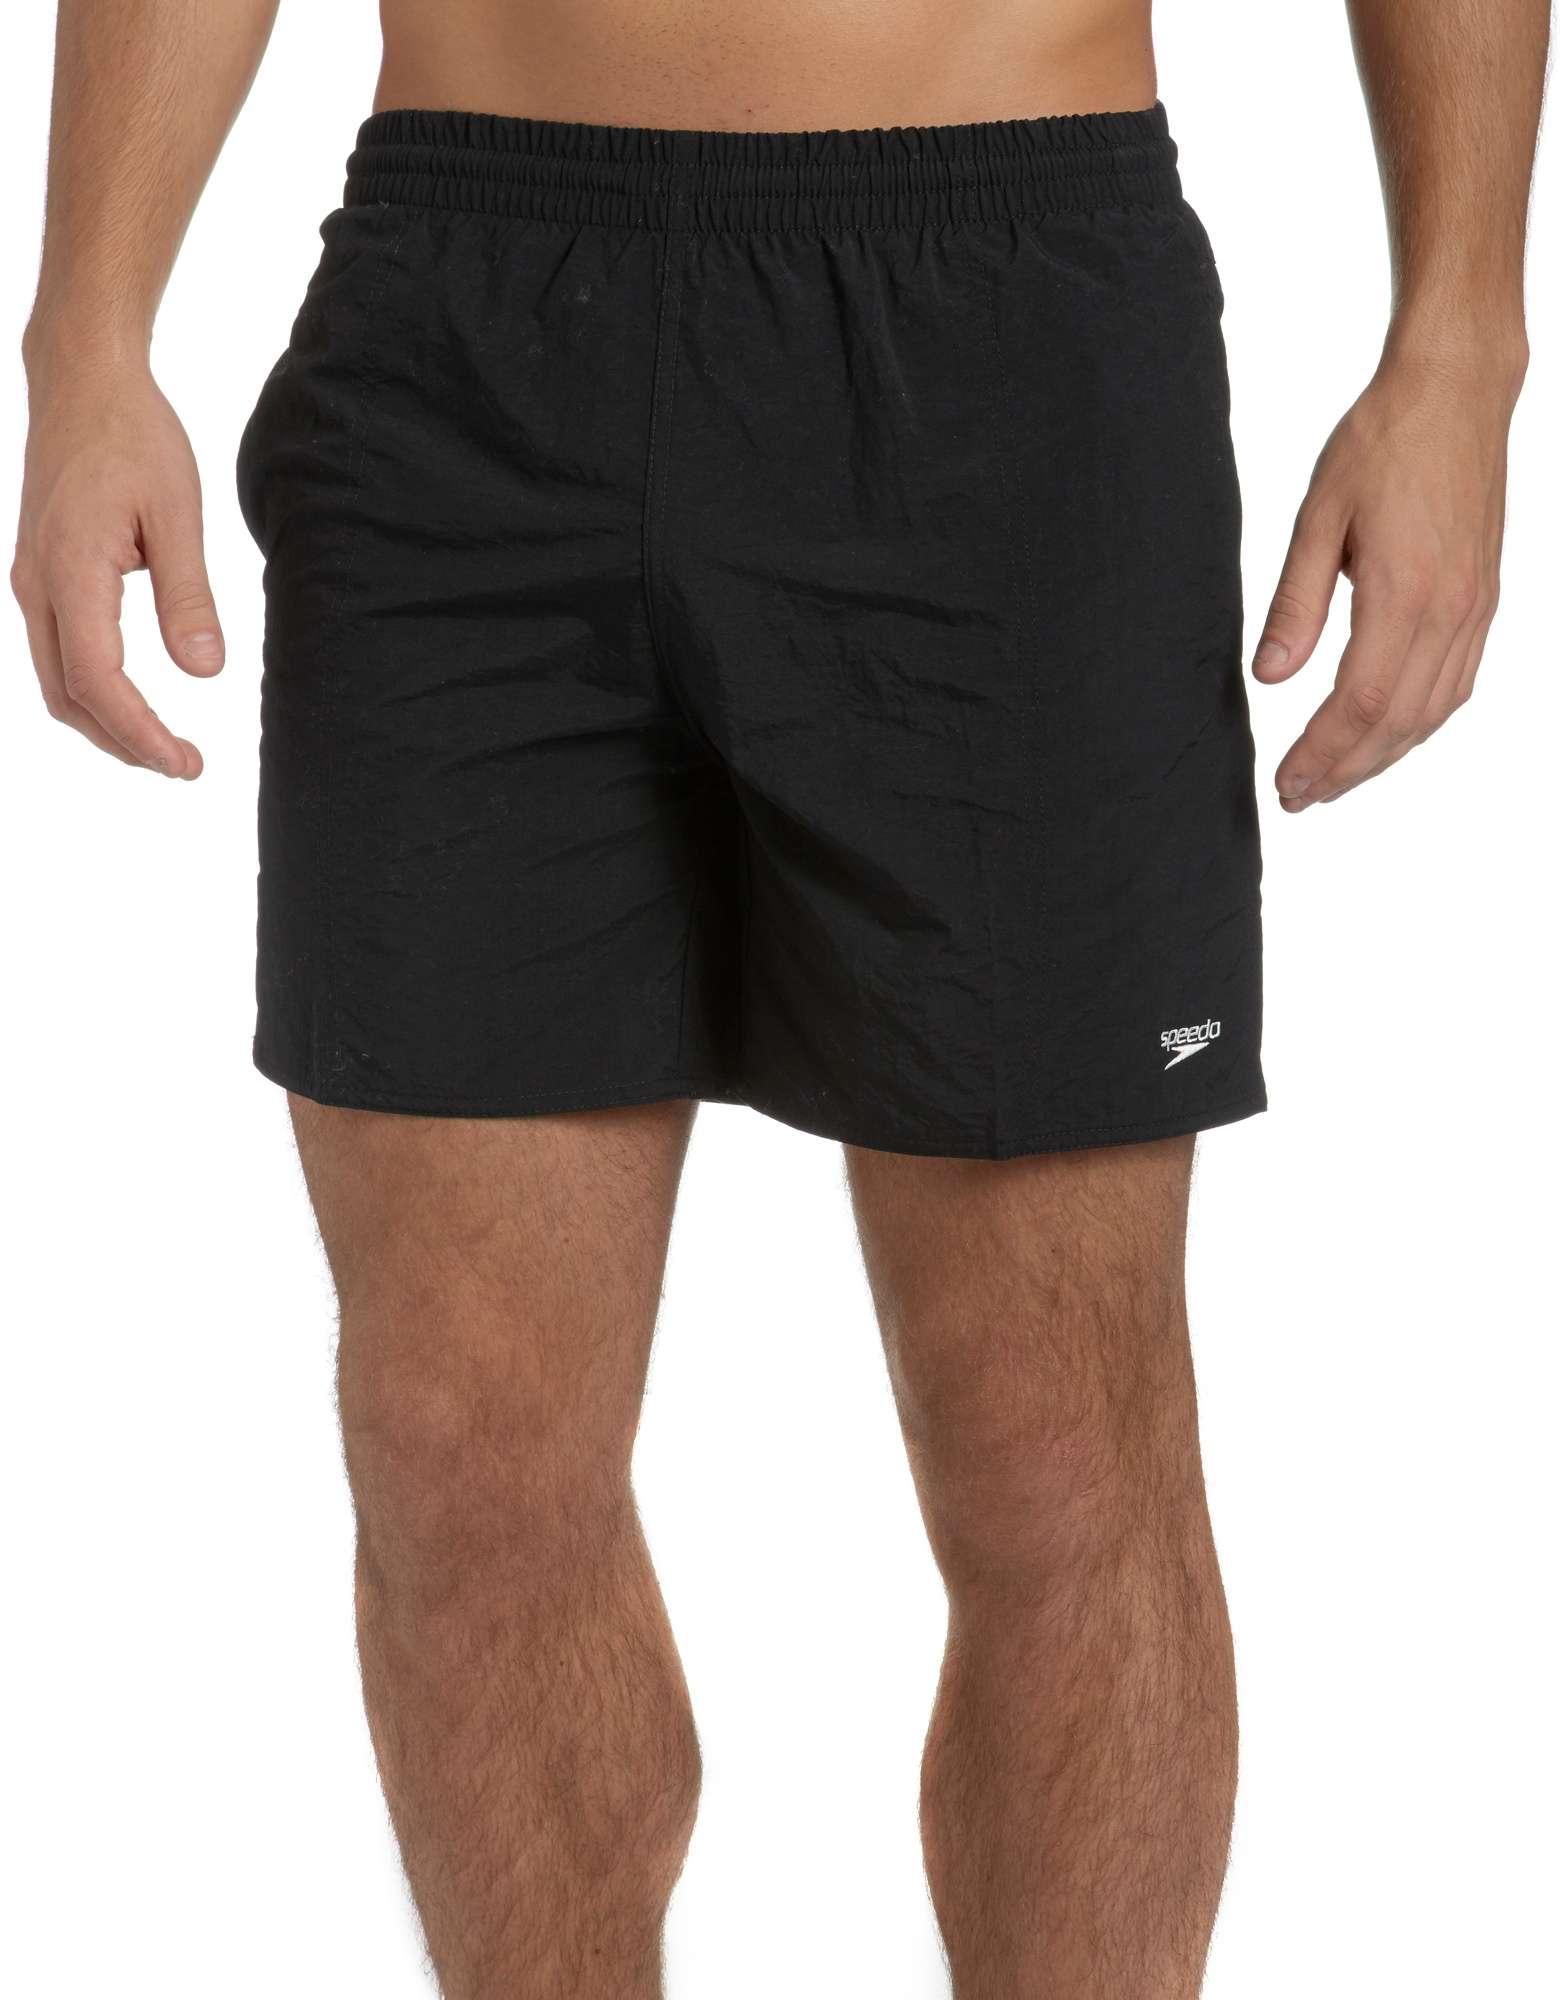 aa528551f574 Speedo Solid Leasure Shorts